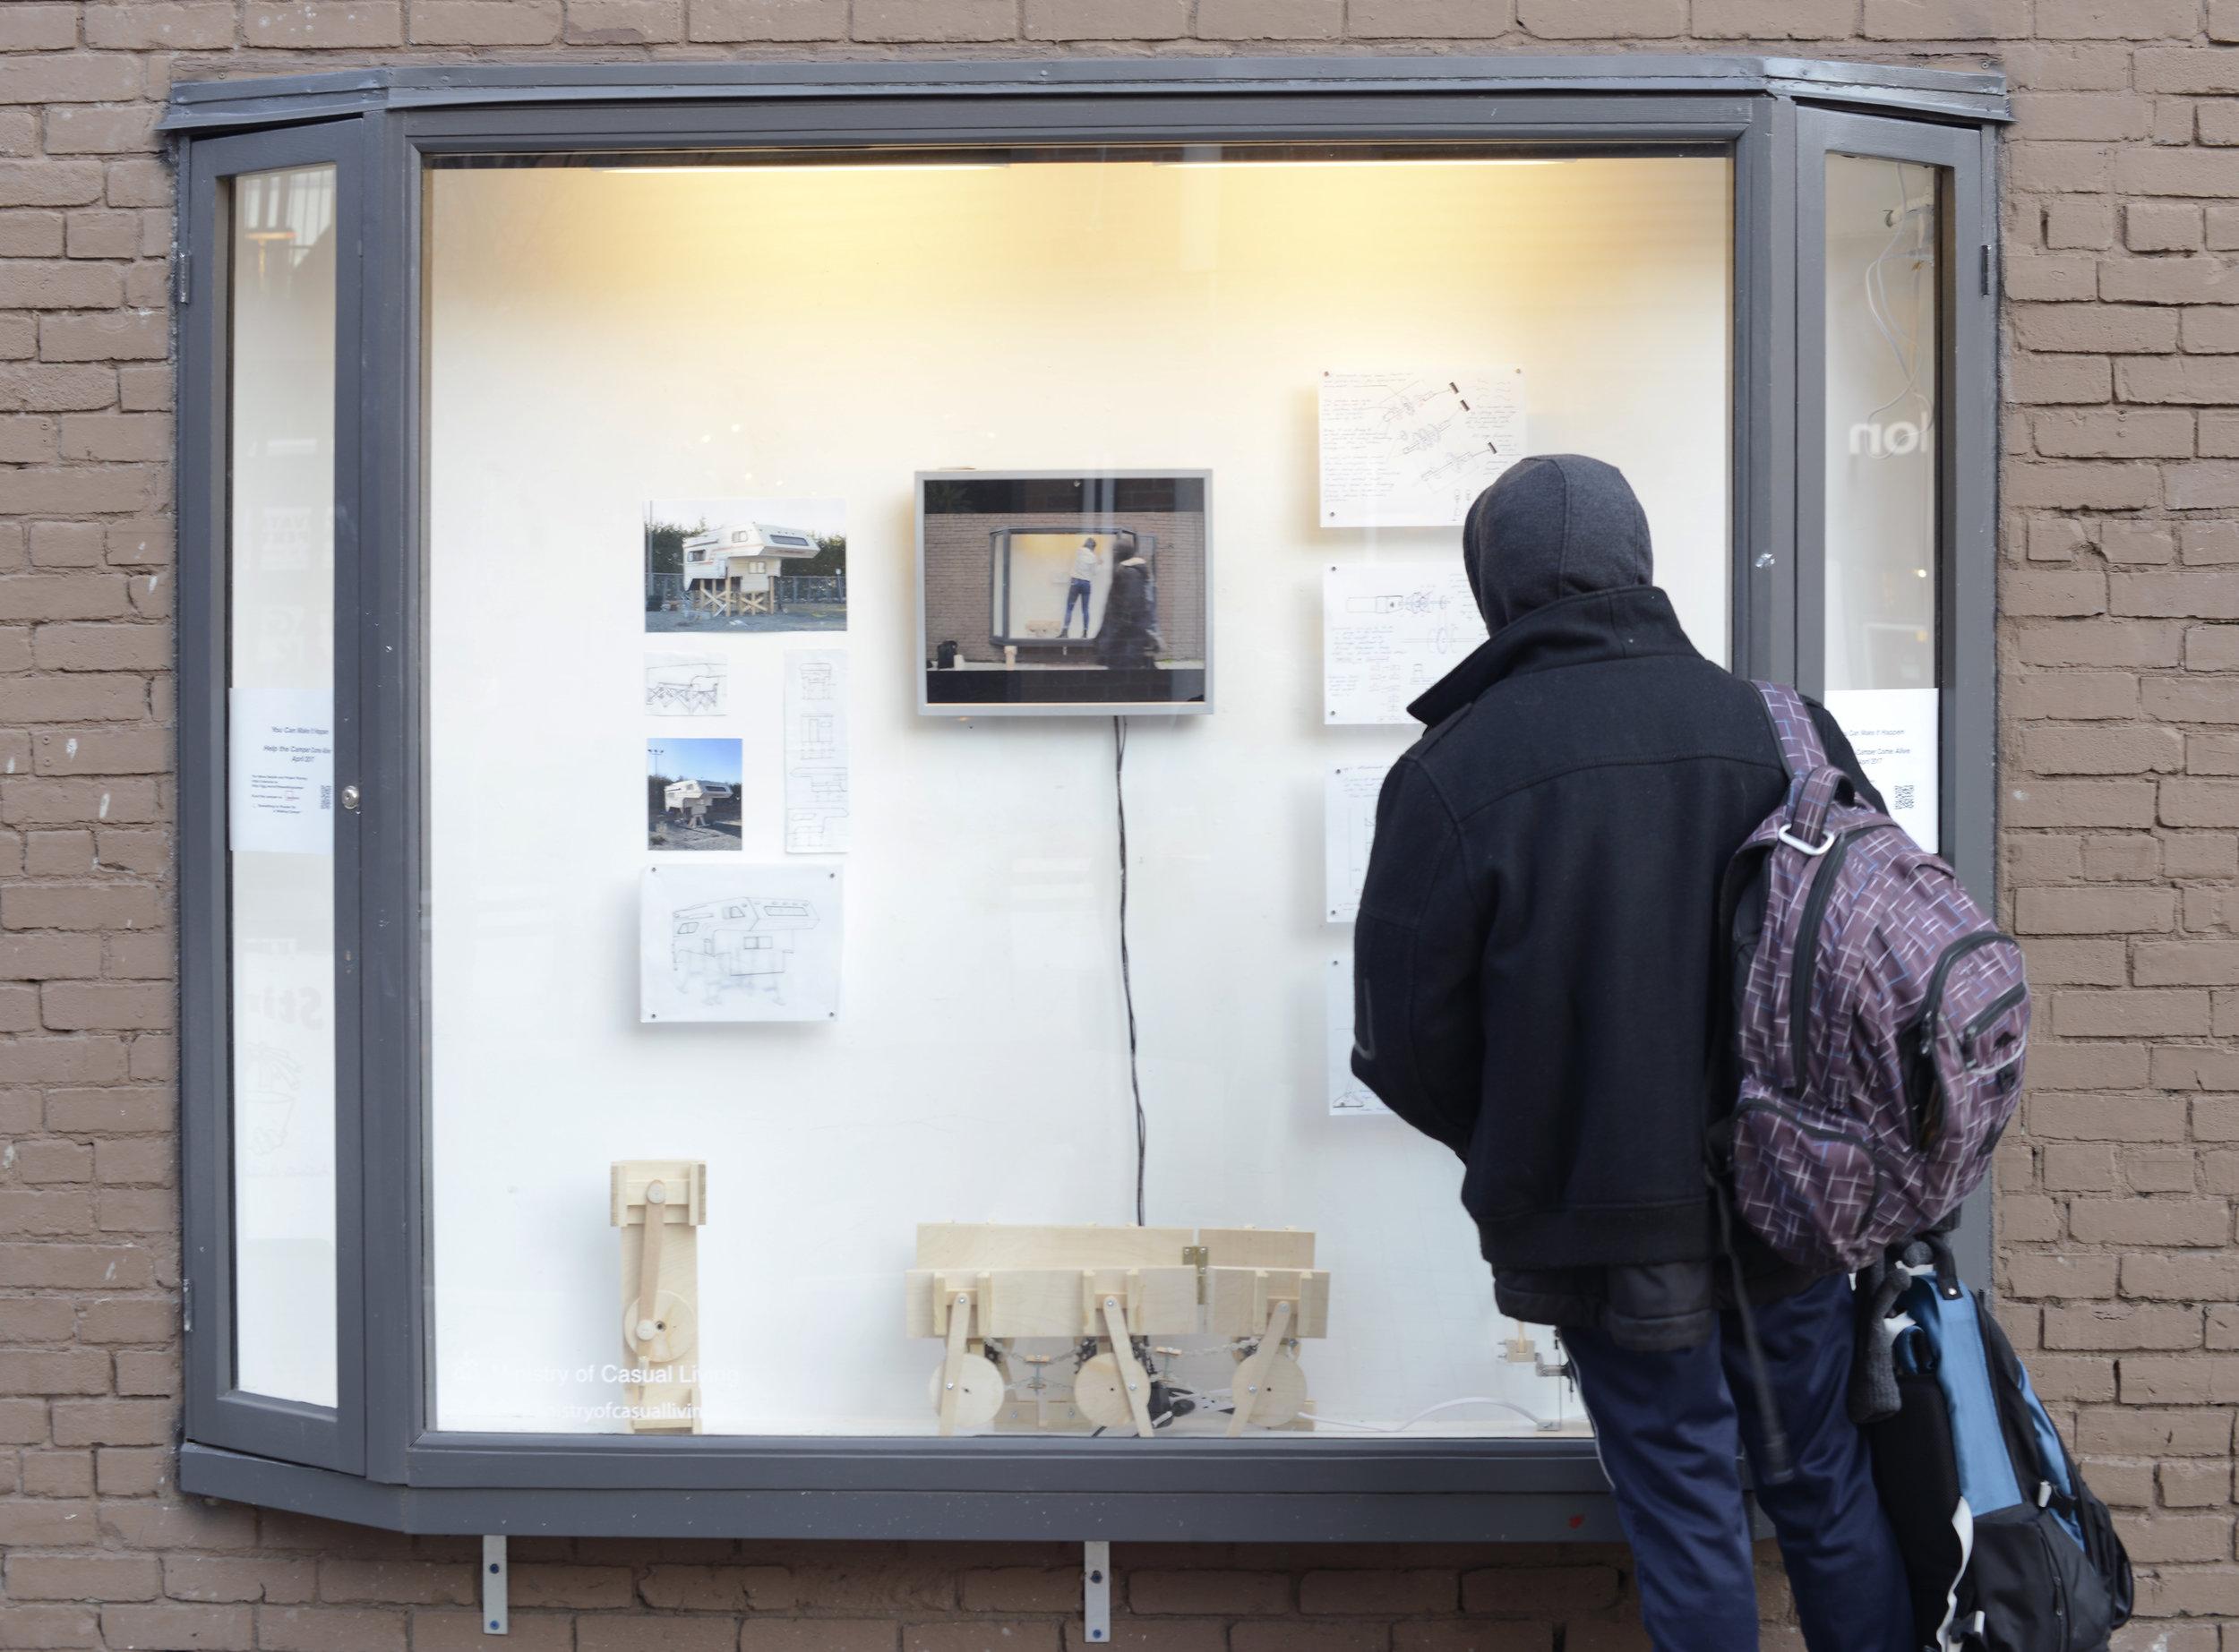 Odeon Alley Window Gallery display